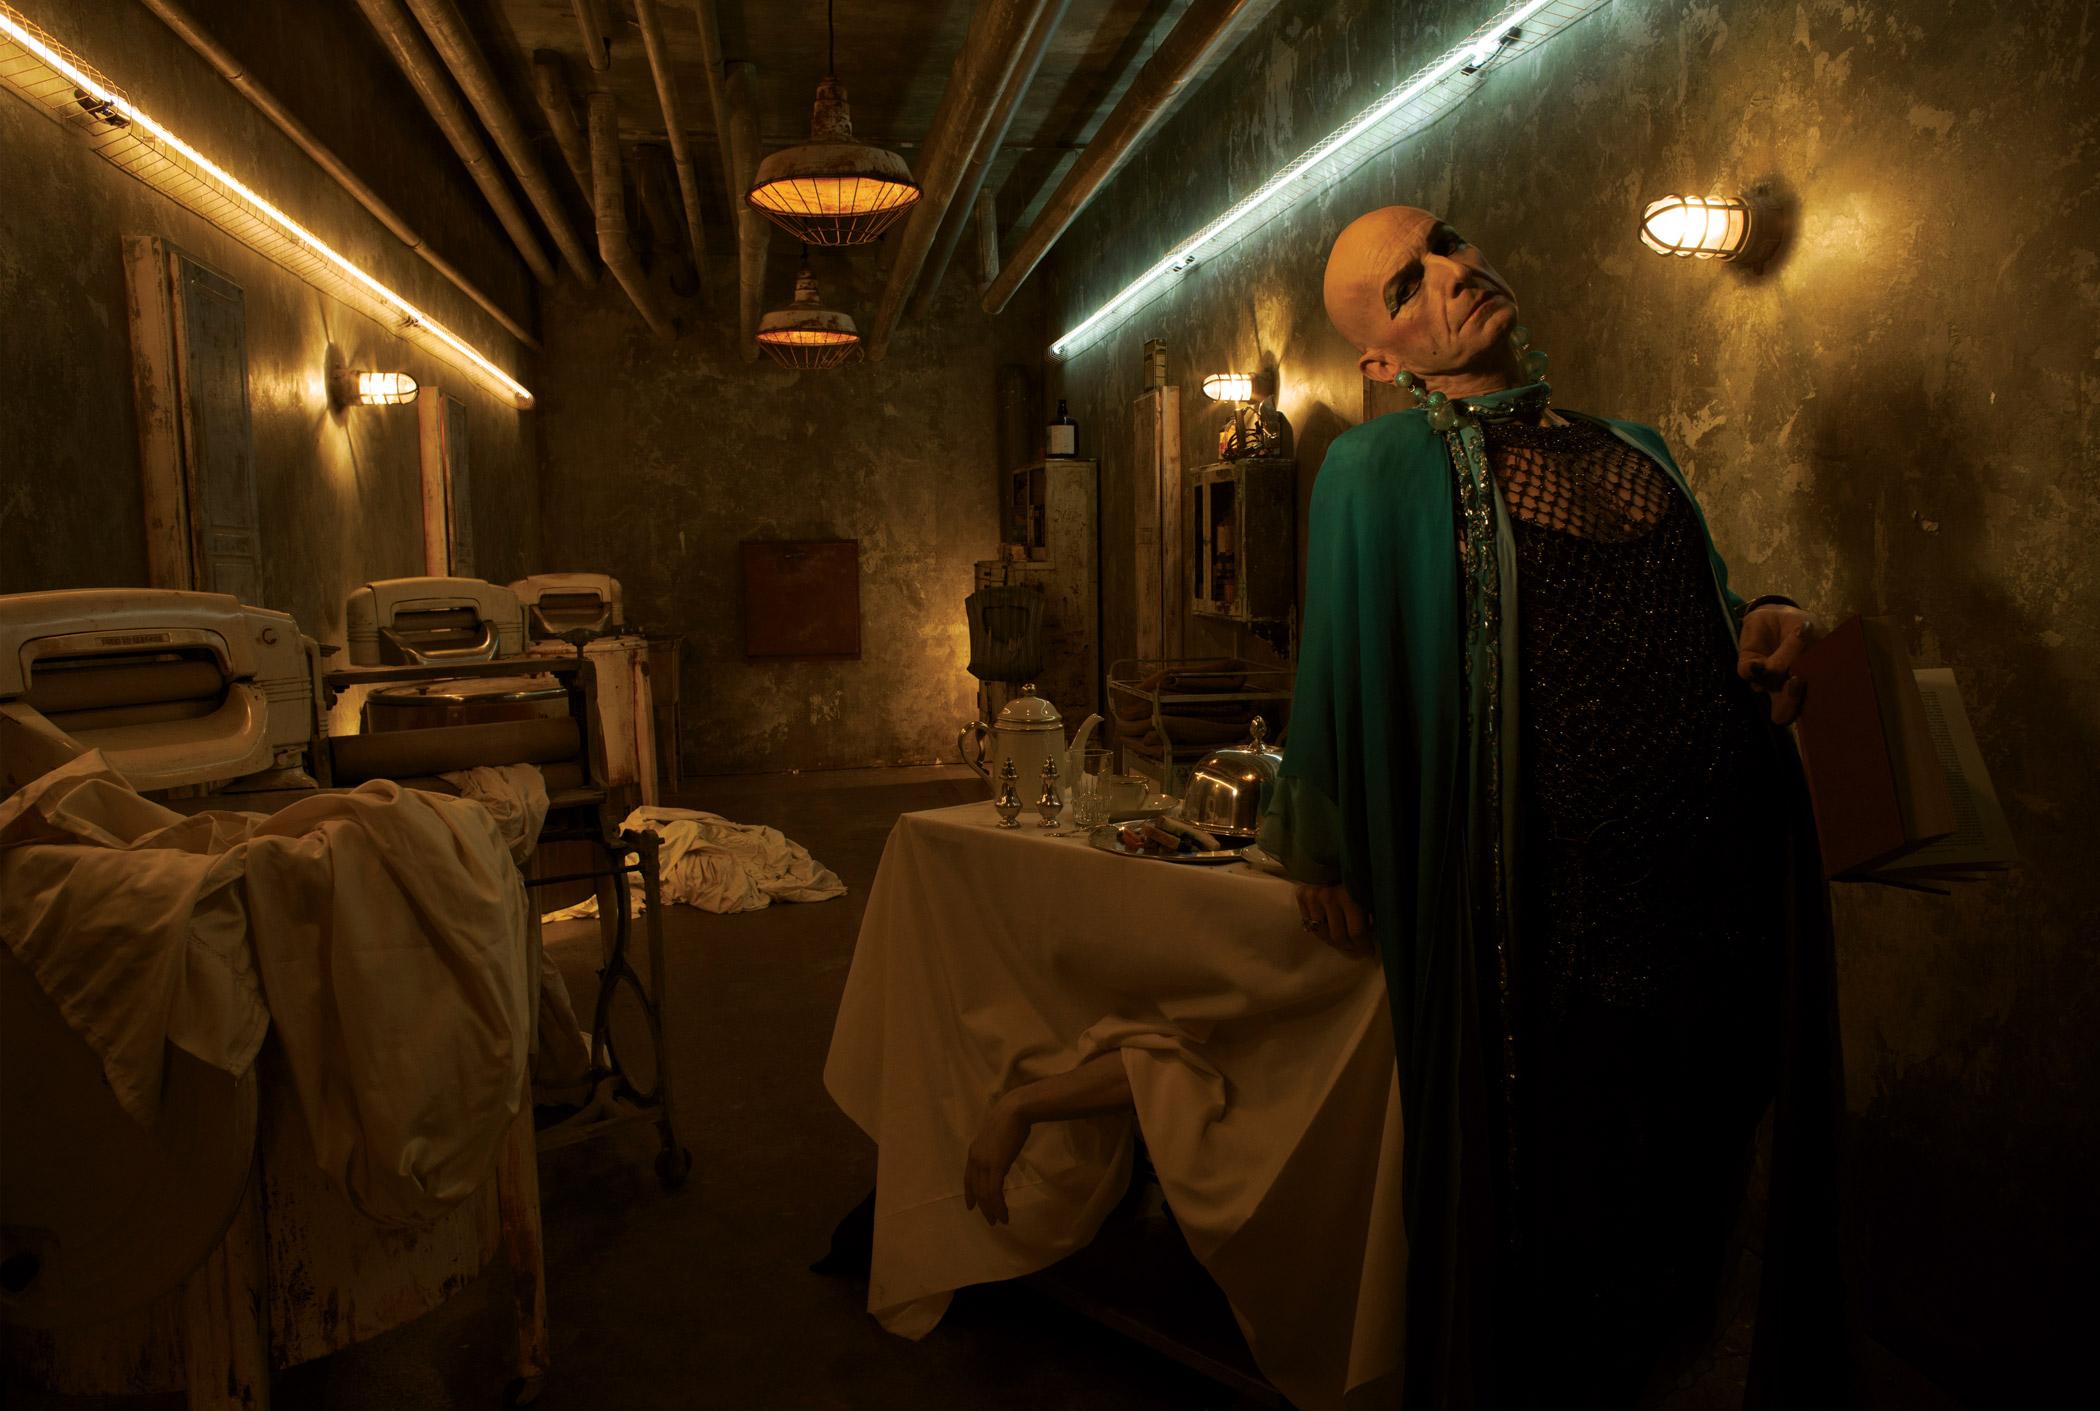 Denis O'Hare as Liz Taylor